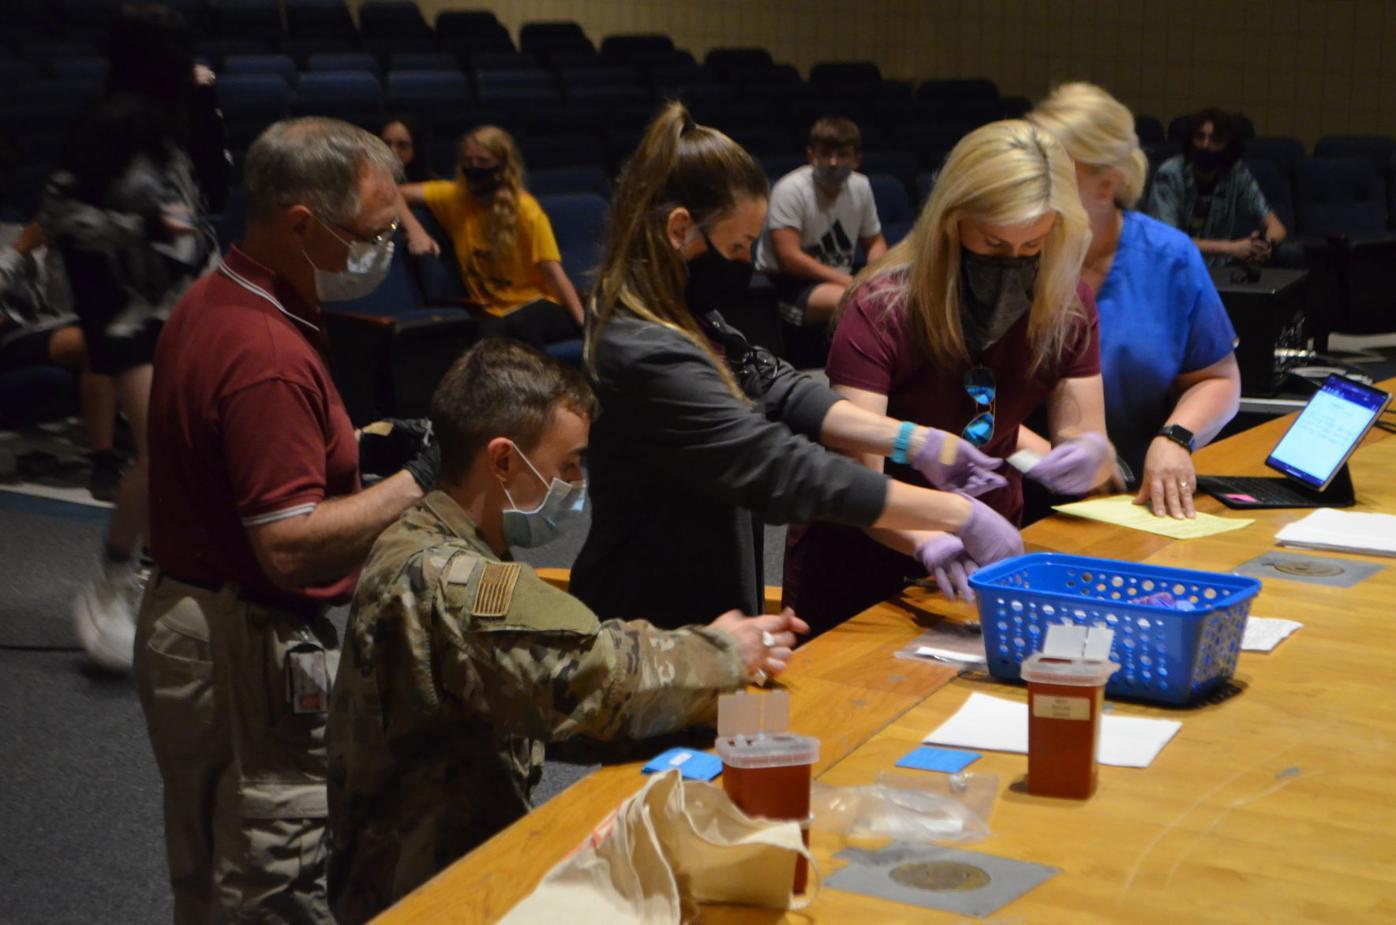 Preparing vaccine at EFHS